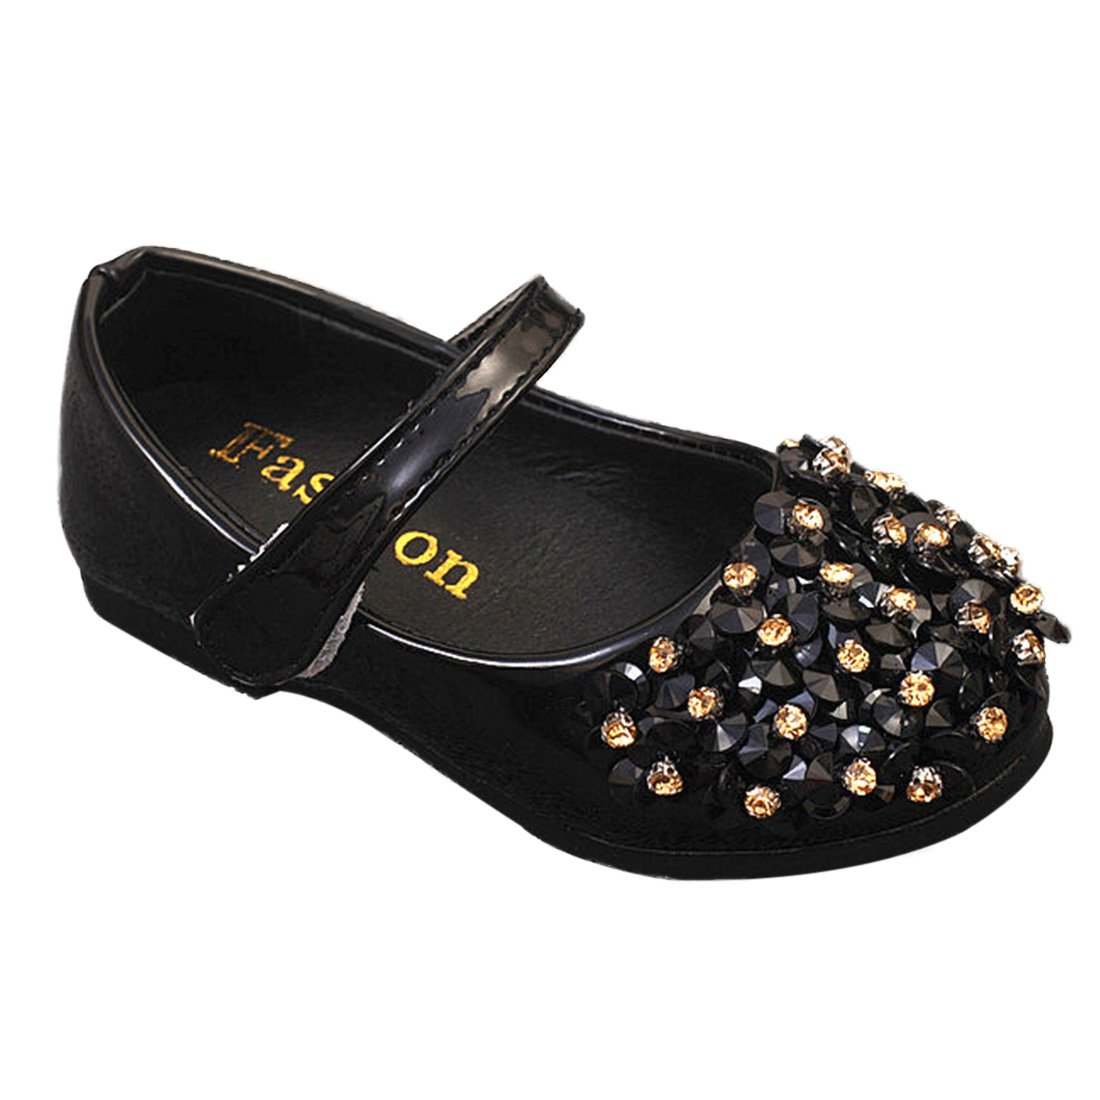 YIBLBOX Kids Girls Cute Ballet Flats Shoes Crystal Mary Janes Wedding Princess Dress Toddler Shoes